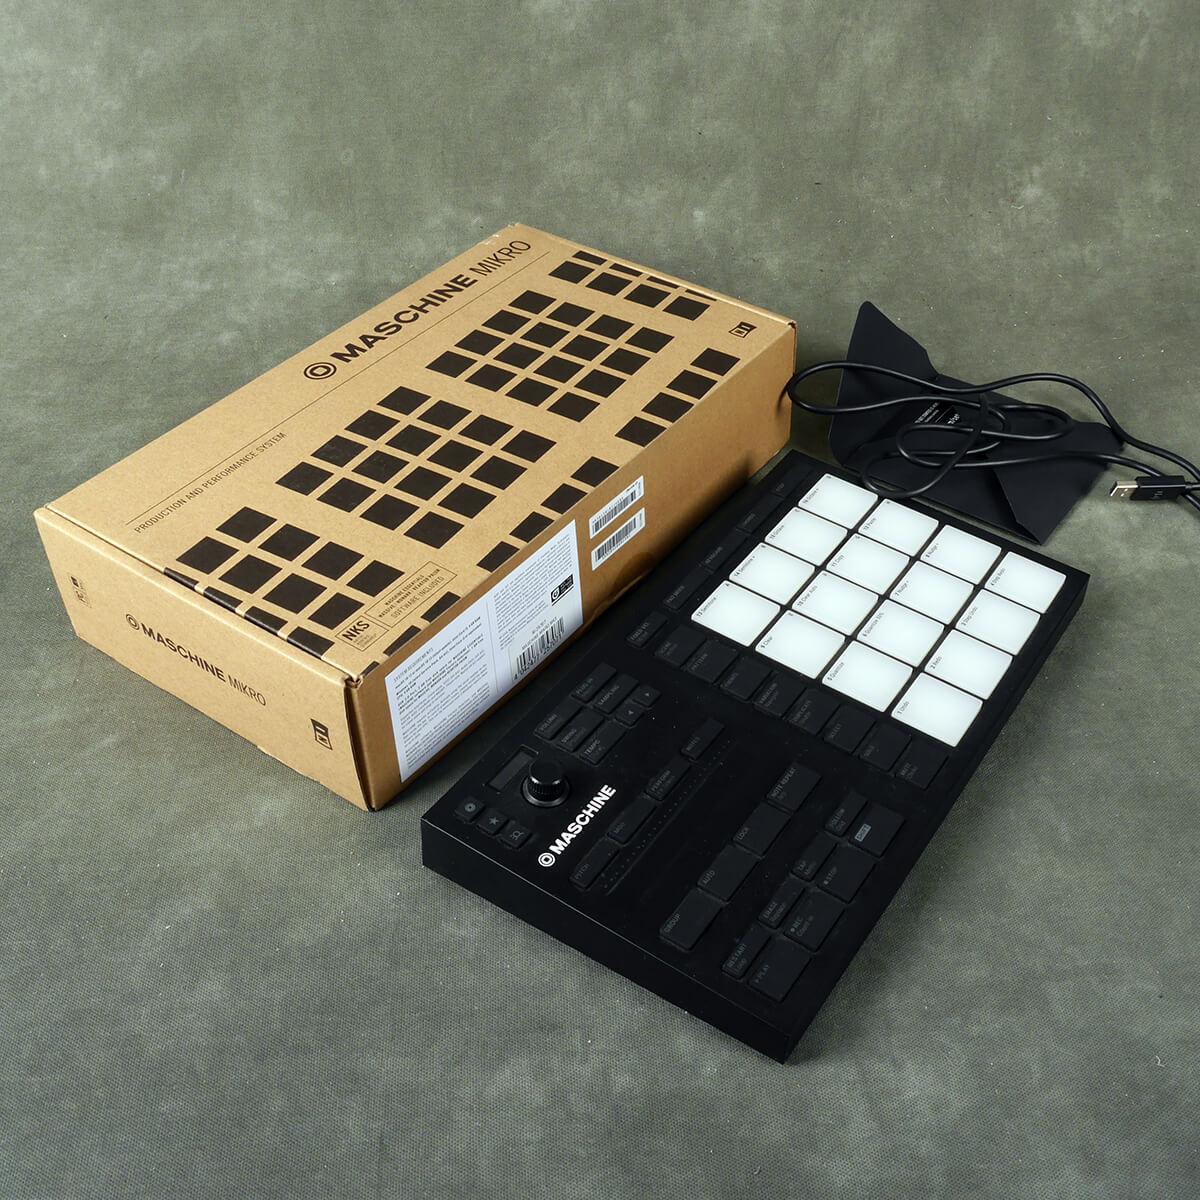 Native Instruments Maschine Mikro MK3 w/Box - 2nd Hand